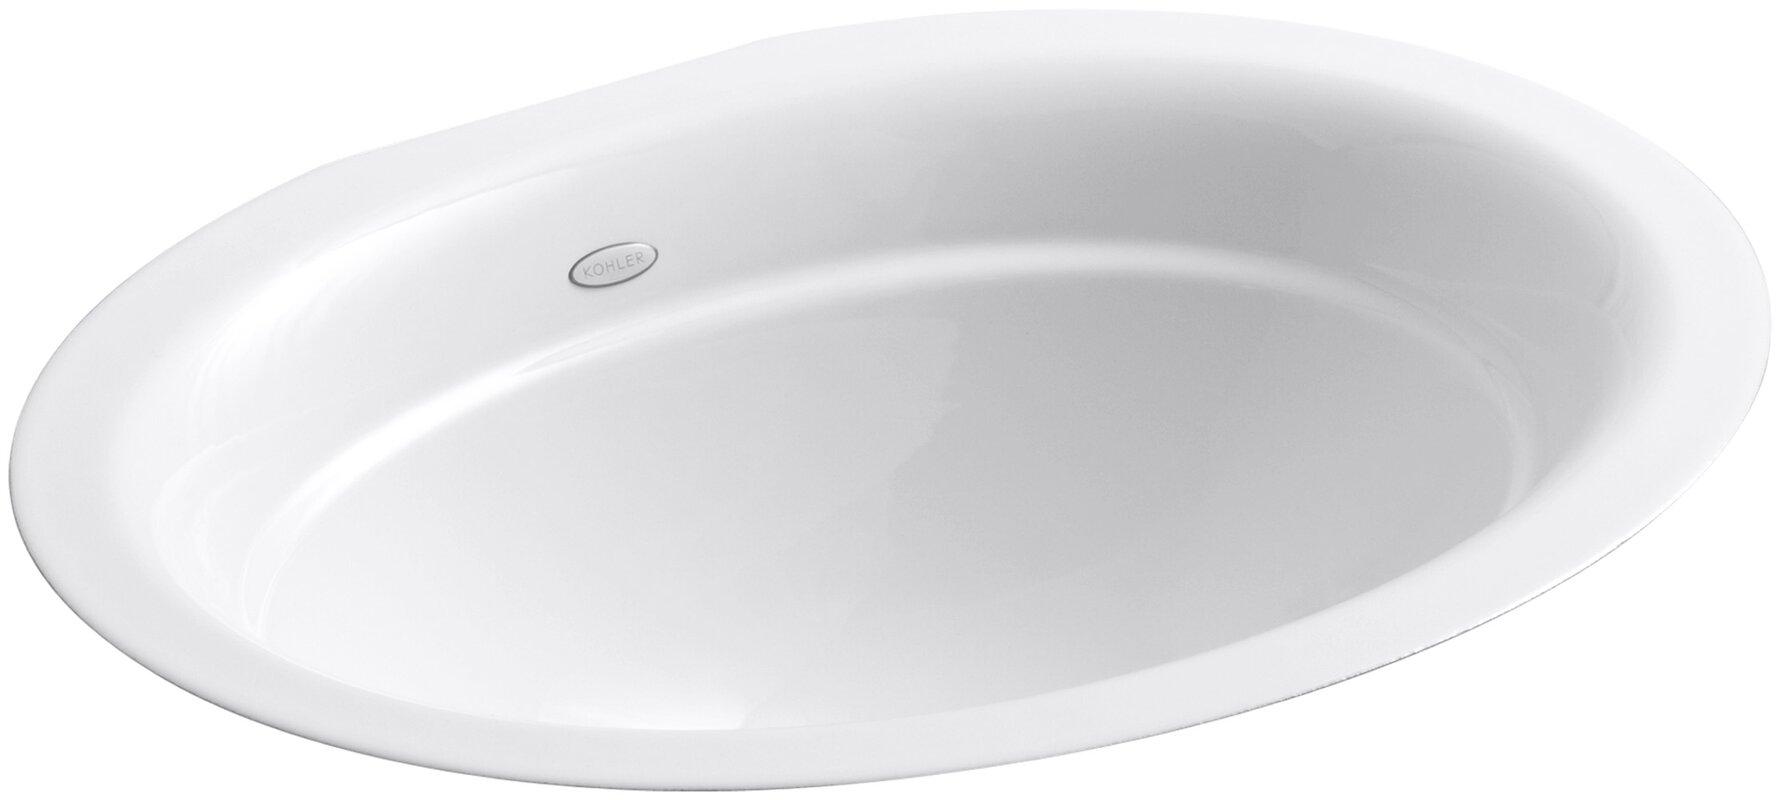 Lovely Serif Metal Oval Undermount Bathroom Sink